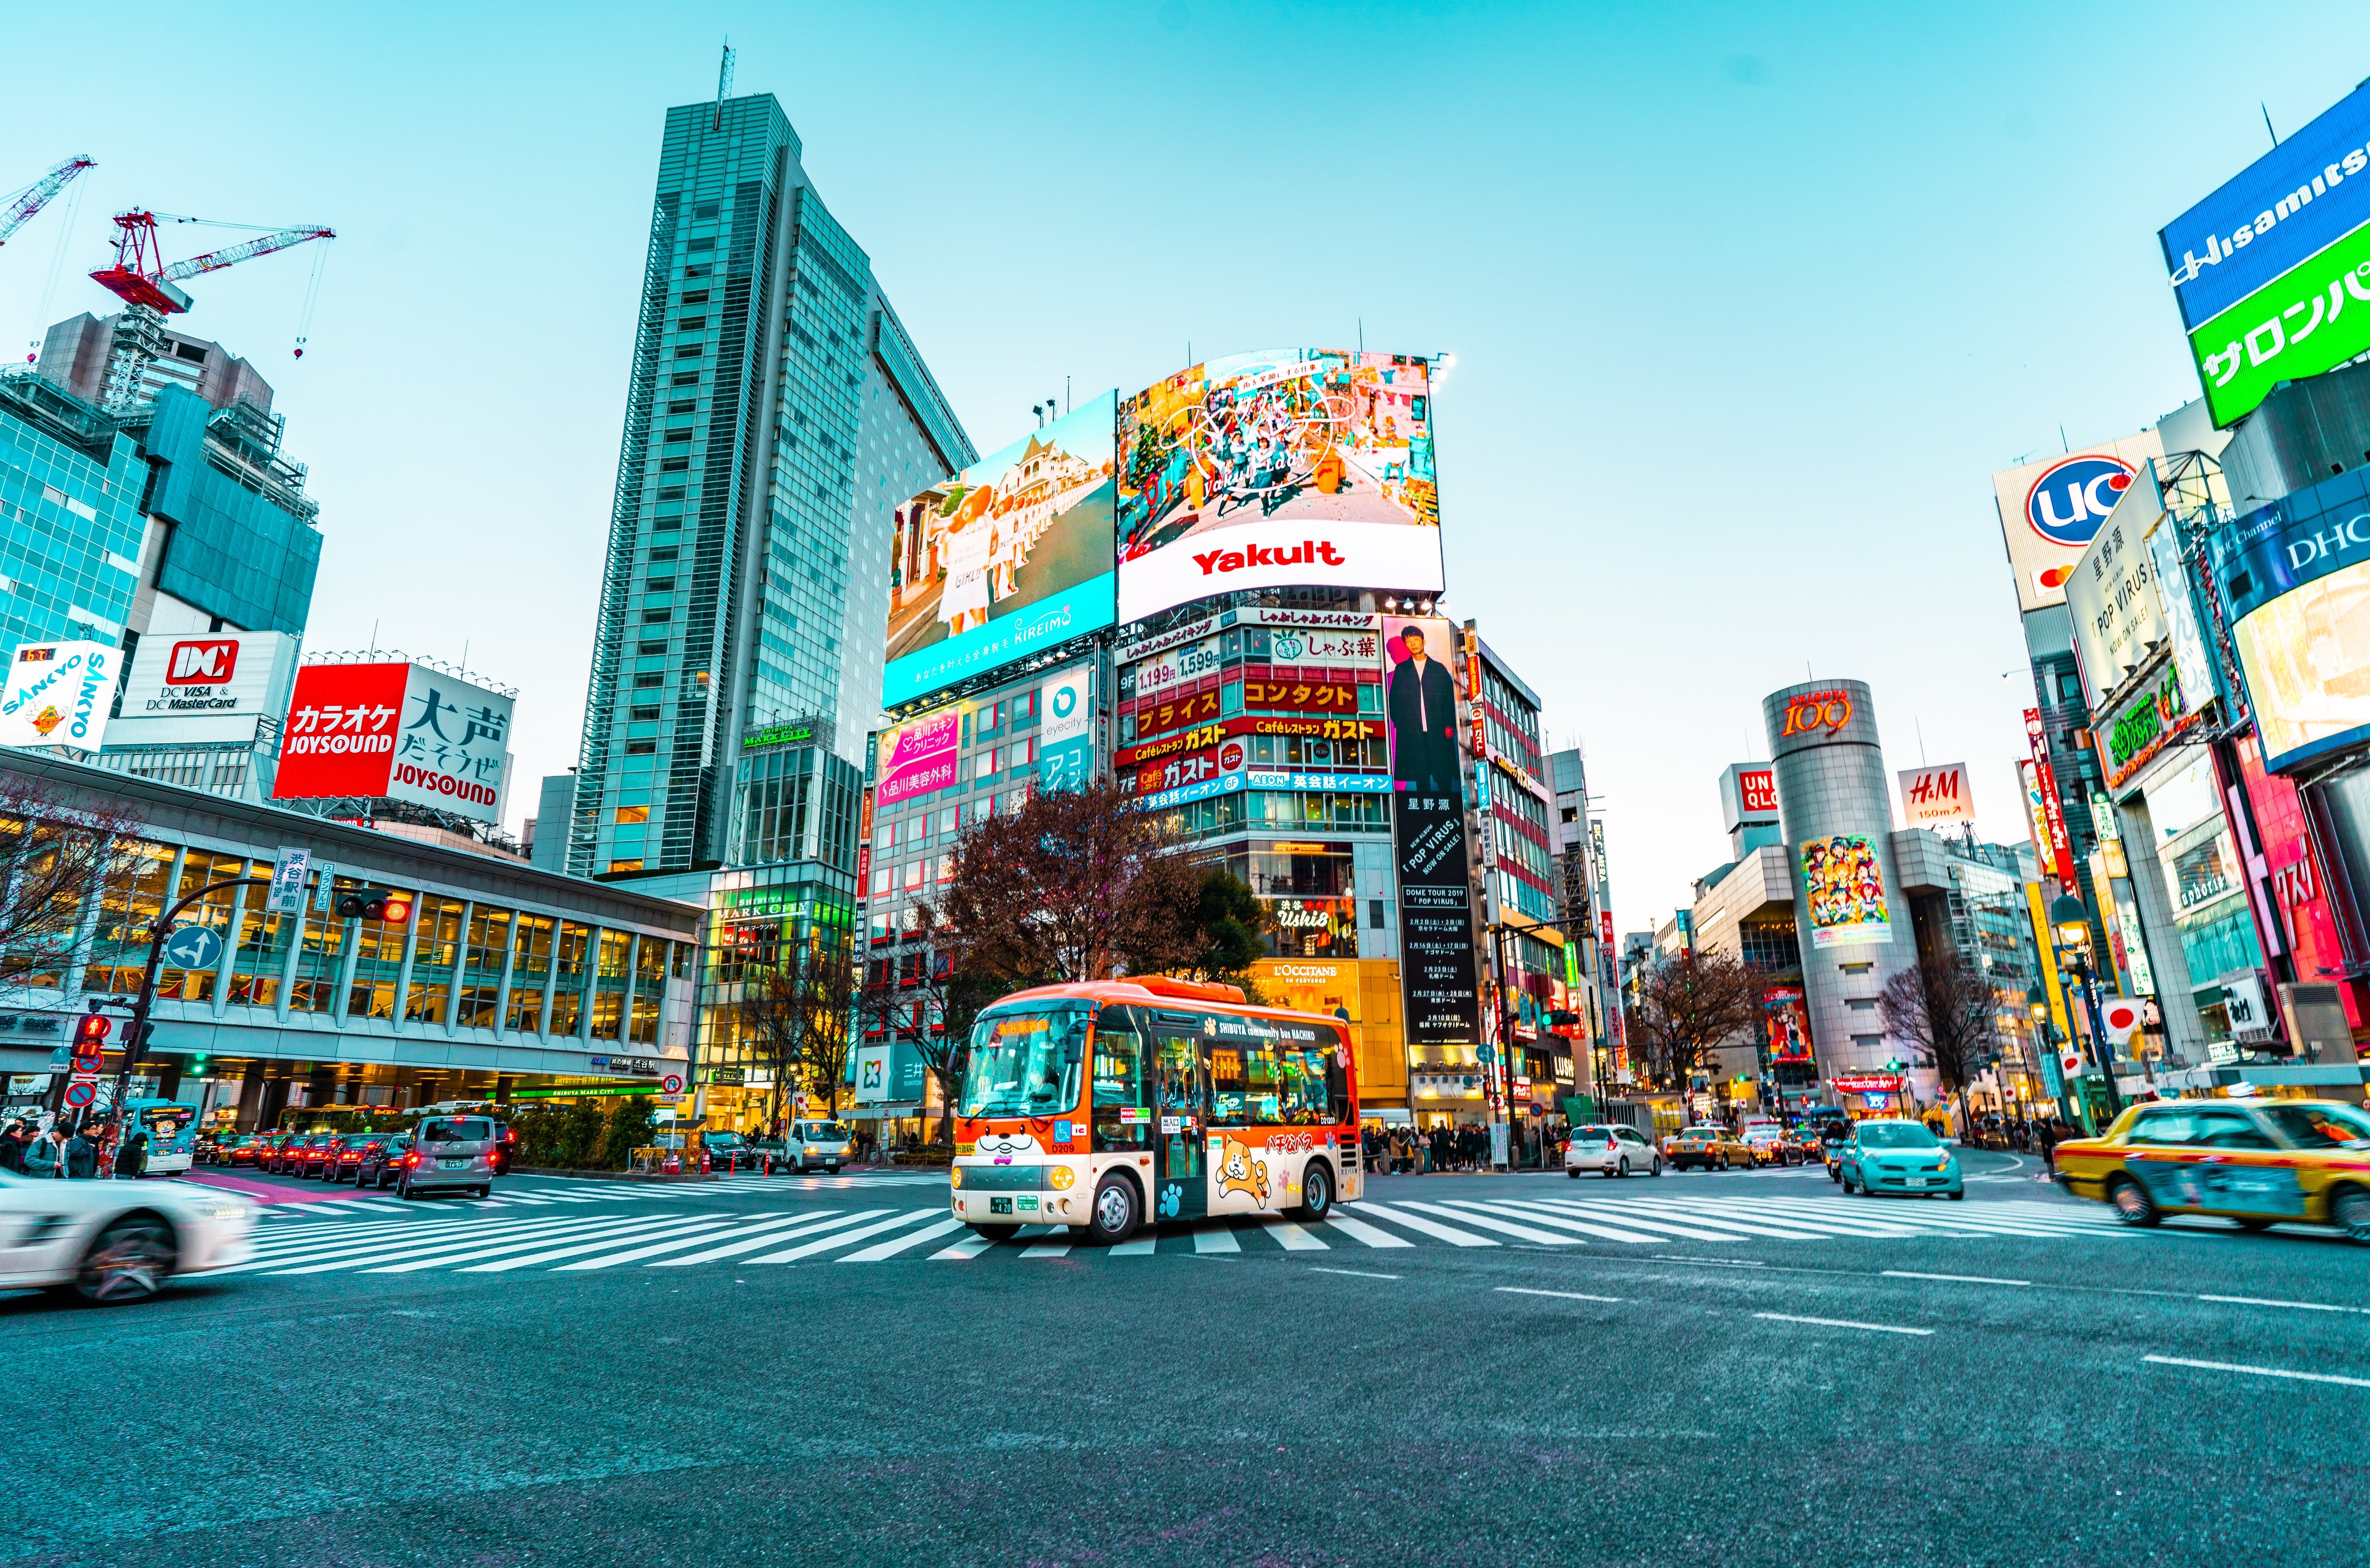 tokyo the model megacity